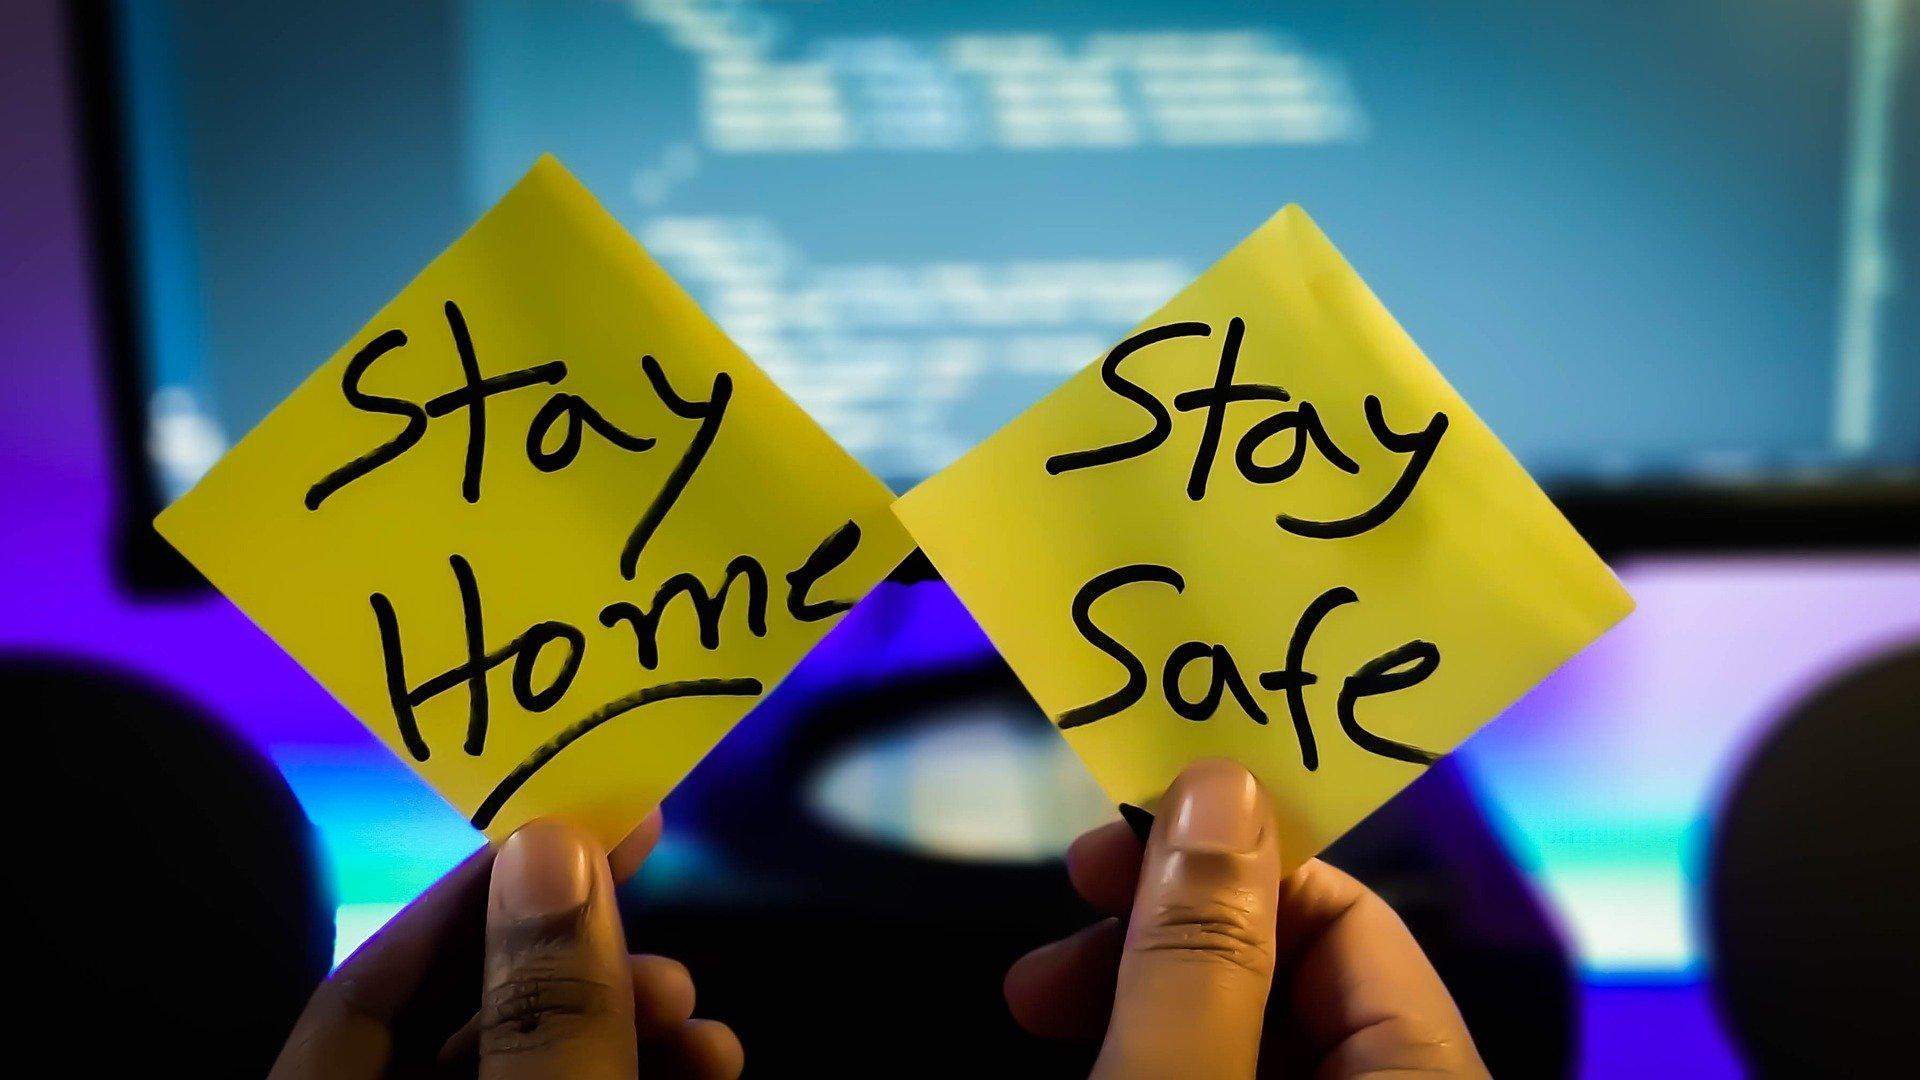 STAYHOME STAY SAFE